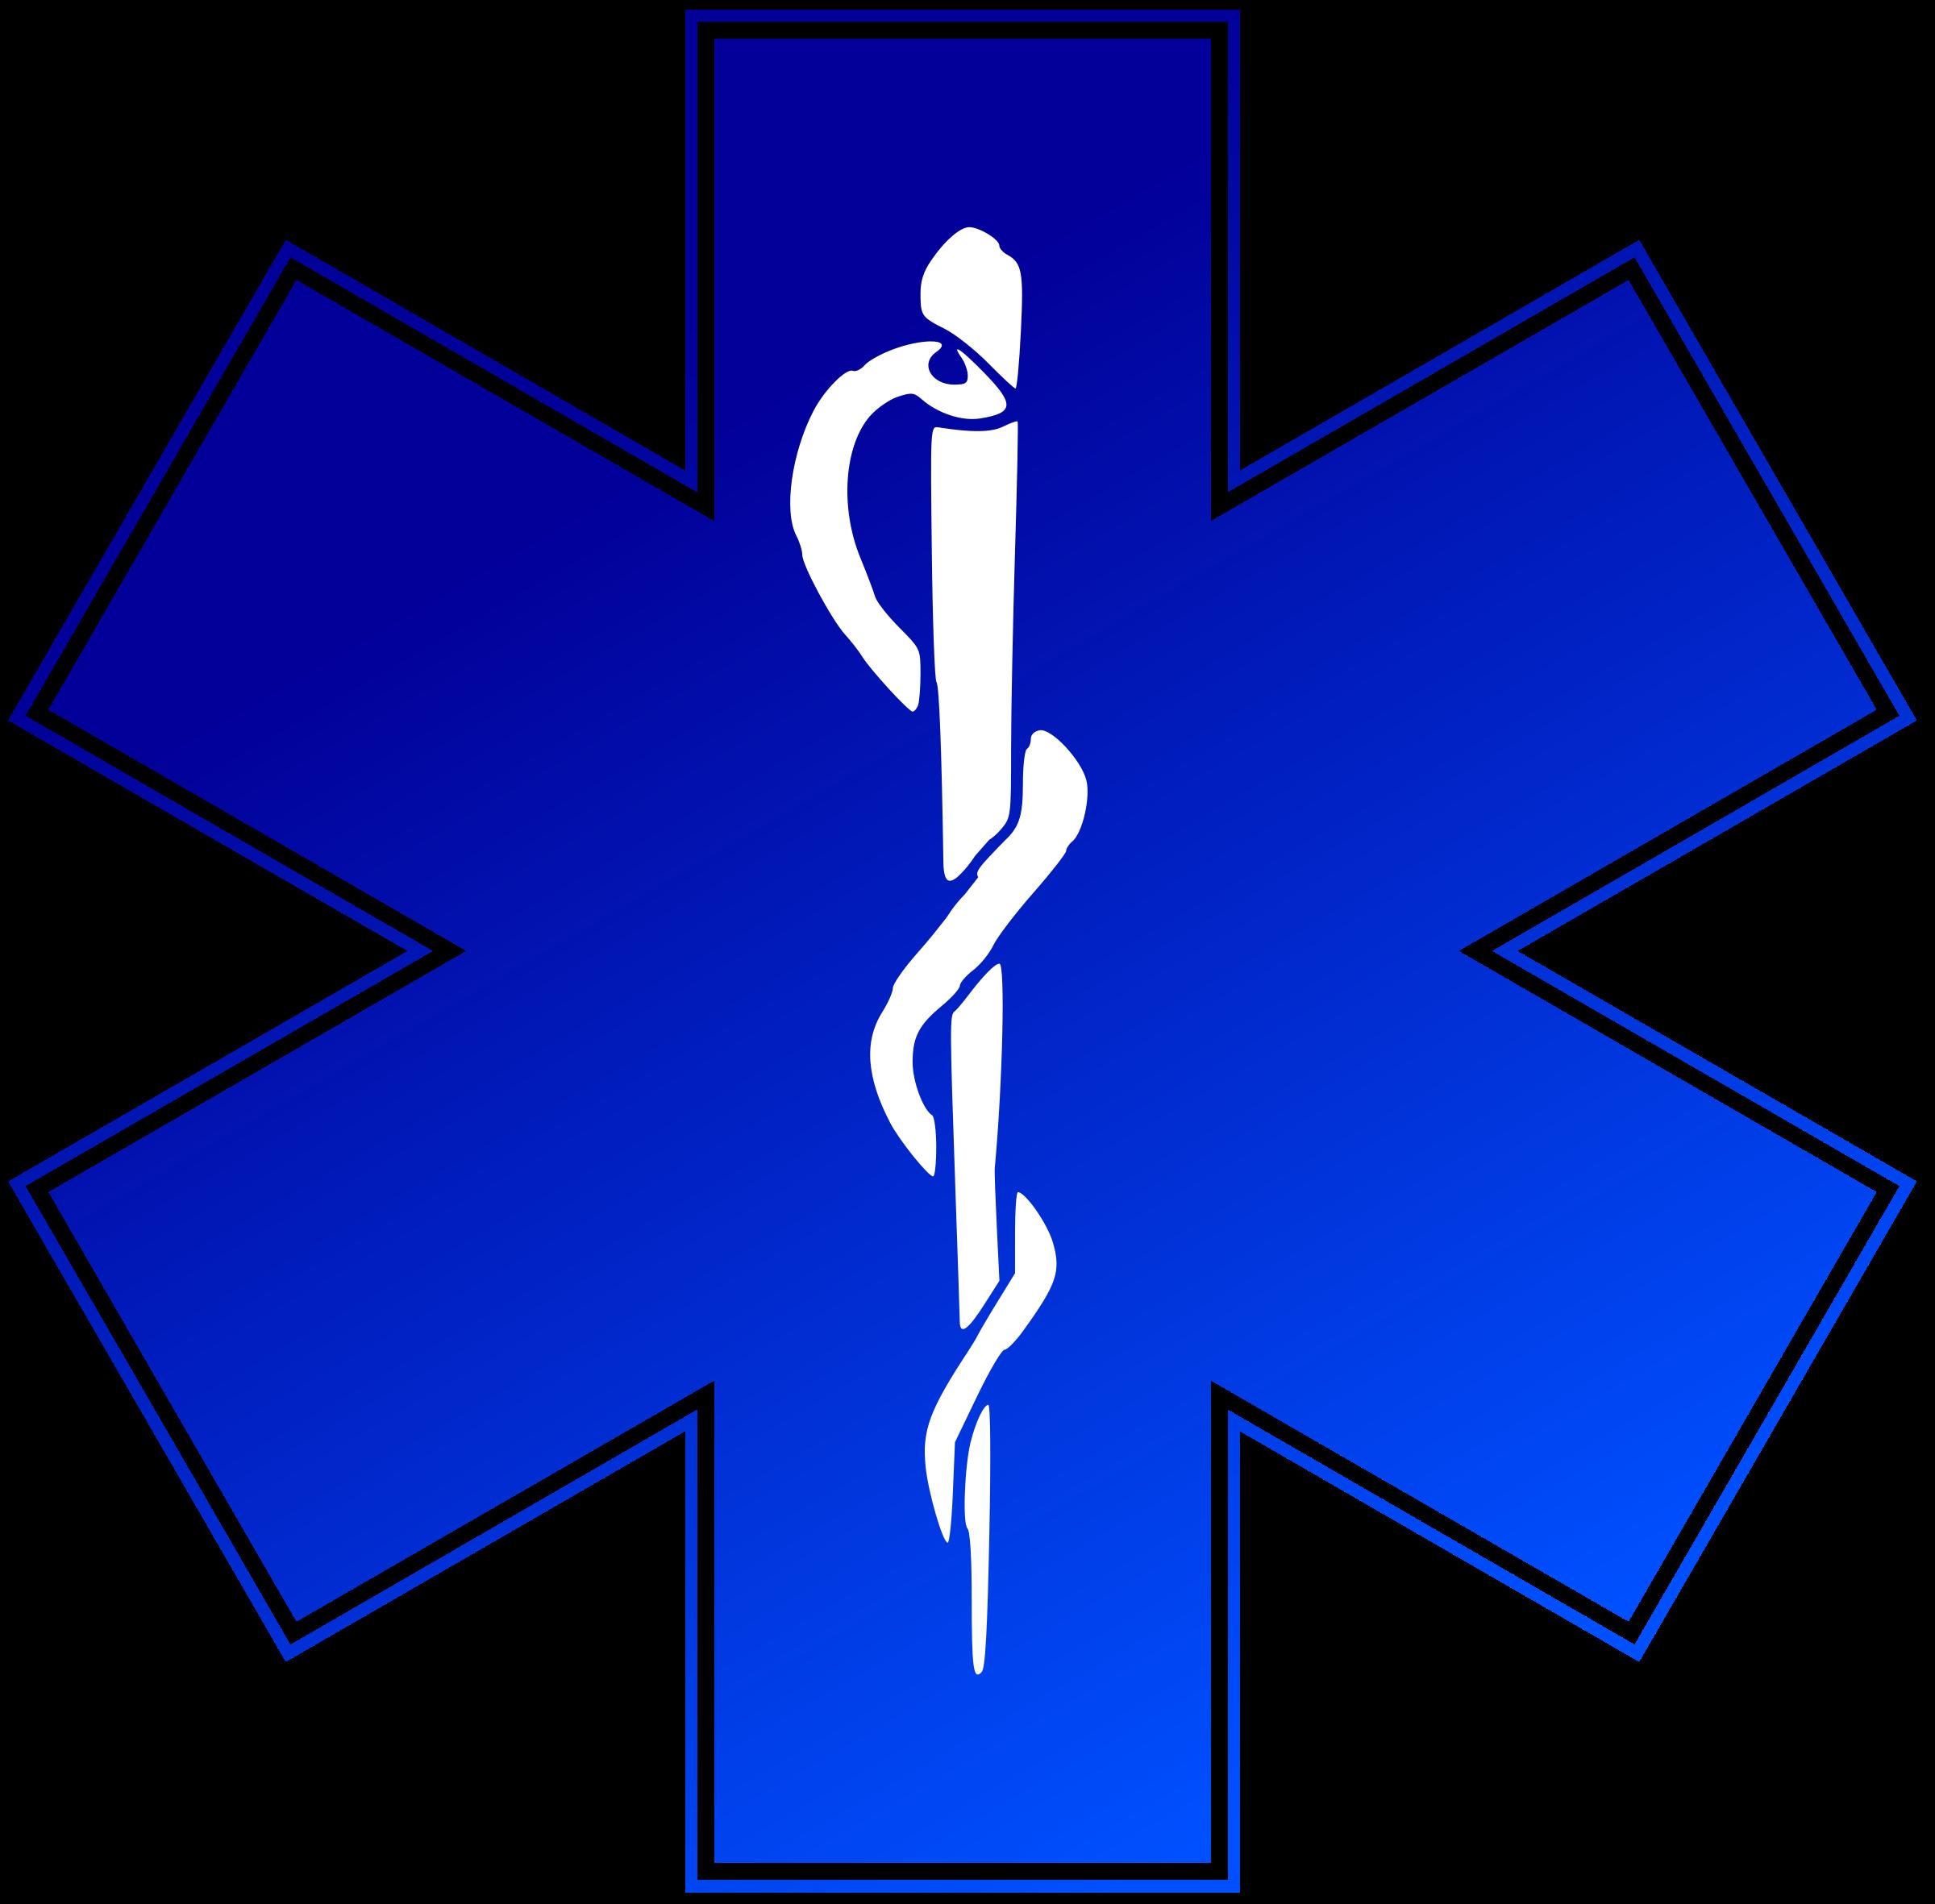 Medicine Logo Png Medical symbols, Paramedic, Medicine logo